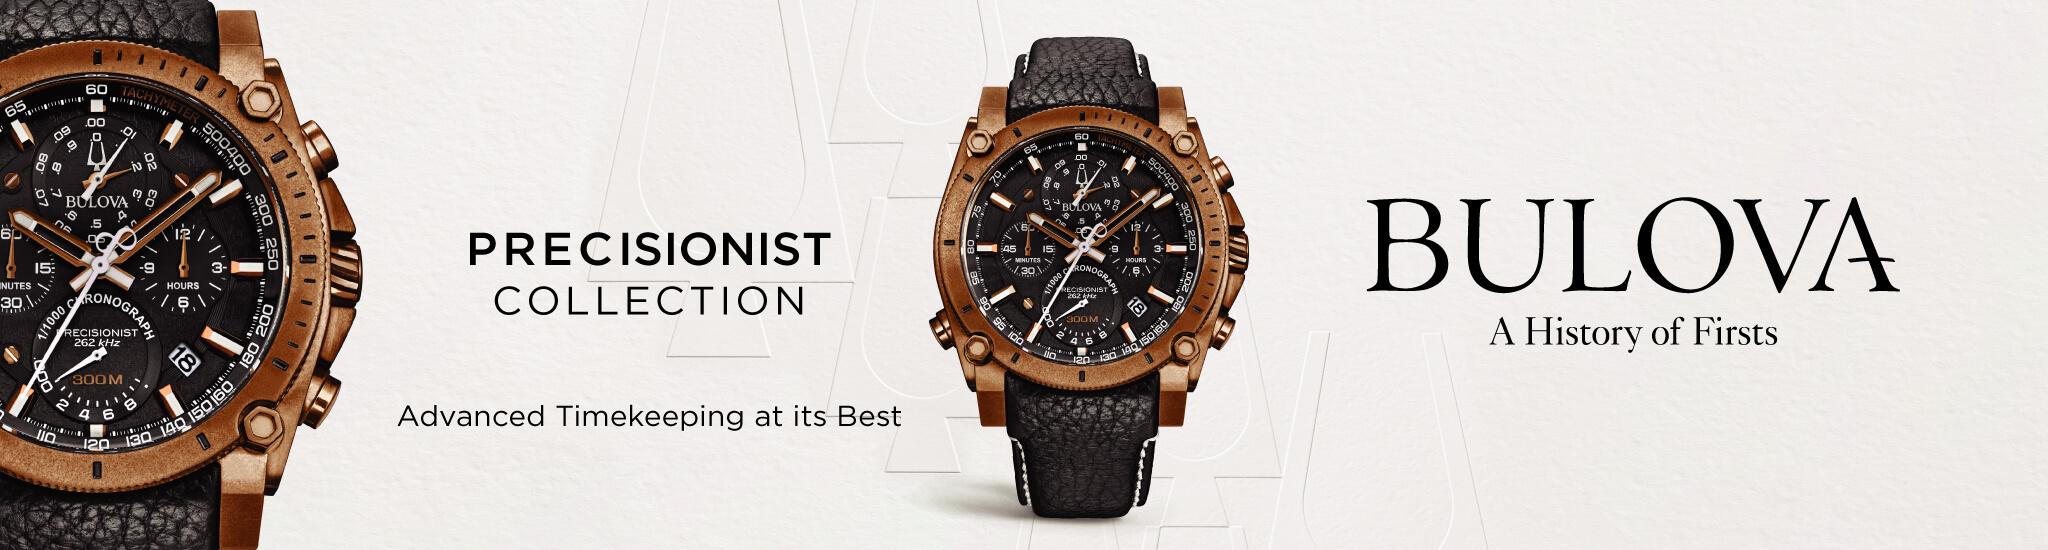 Men's Precisionist Chronograph Watch